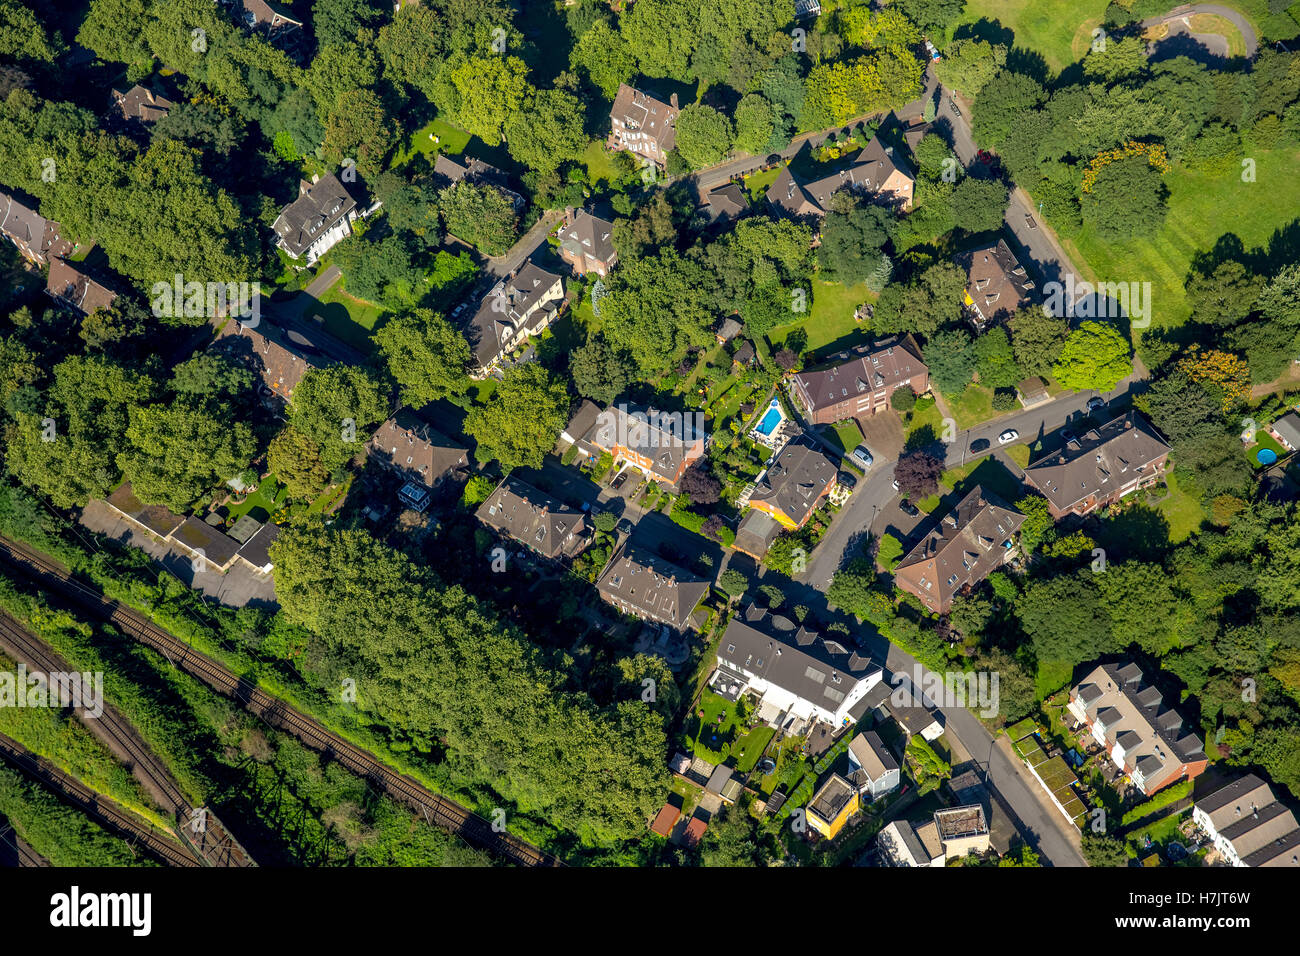 Aerial view, Oberhausen officials colony Grafenbusch, historic housing estate, housing estate for Gutehoffnungshütte - Stock Image